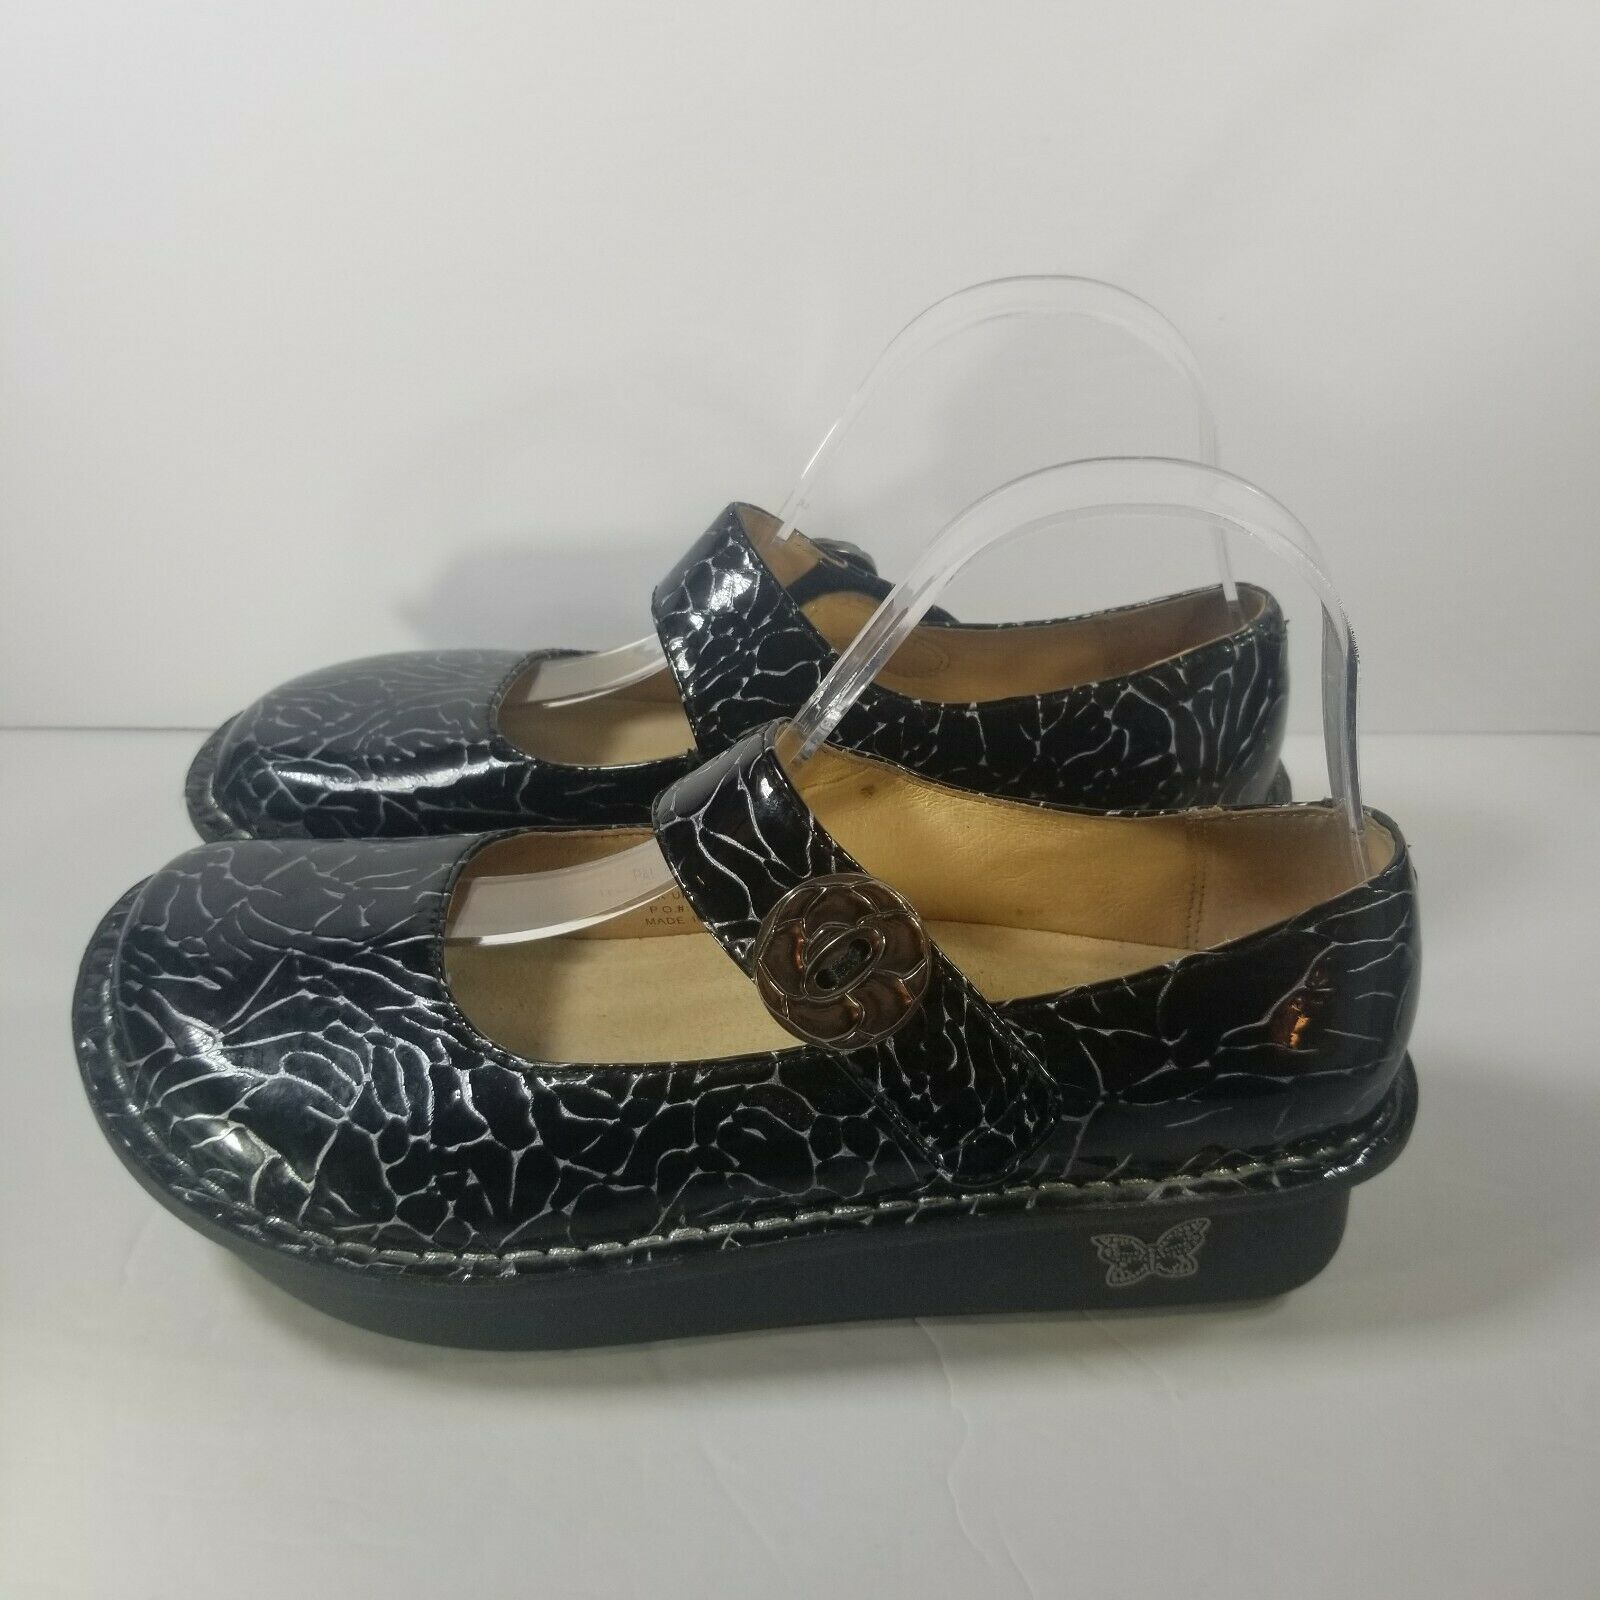 Alegria Womens US 7 EU 37 Black Embossed Rose Mary Jane Shoes PAL-541